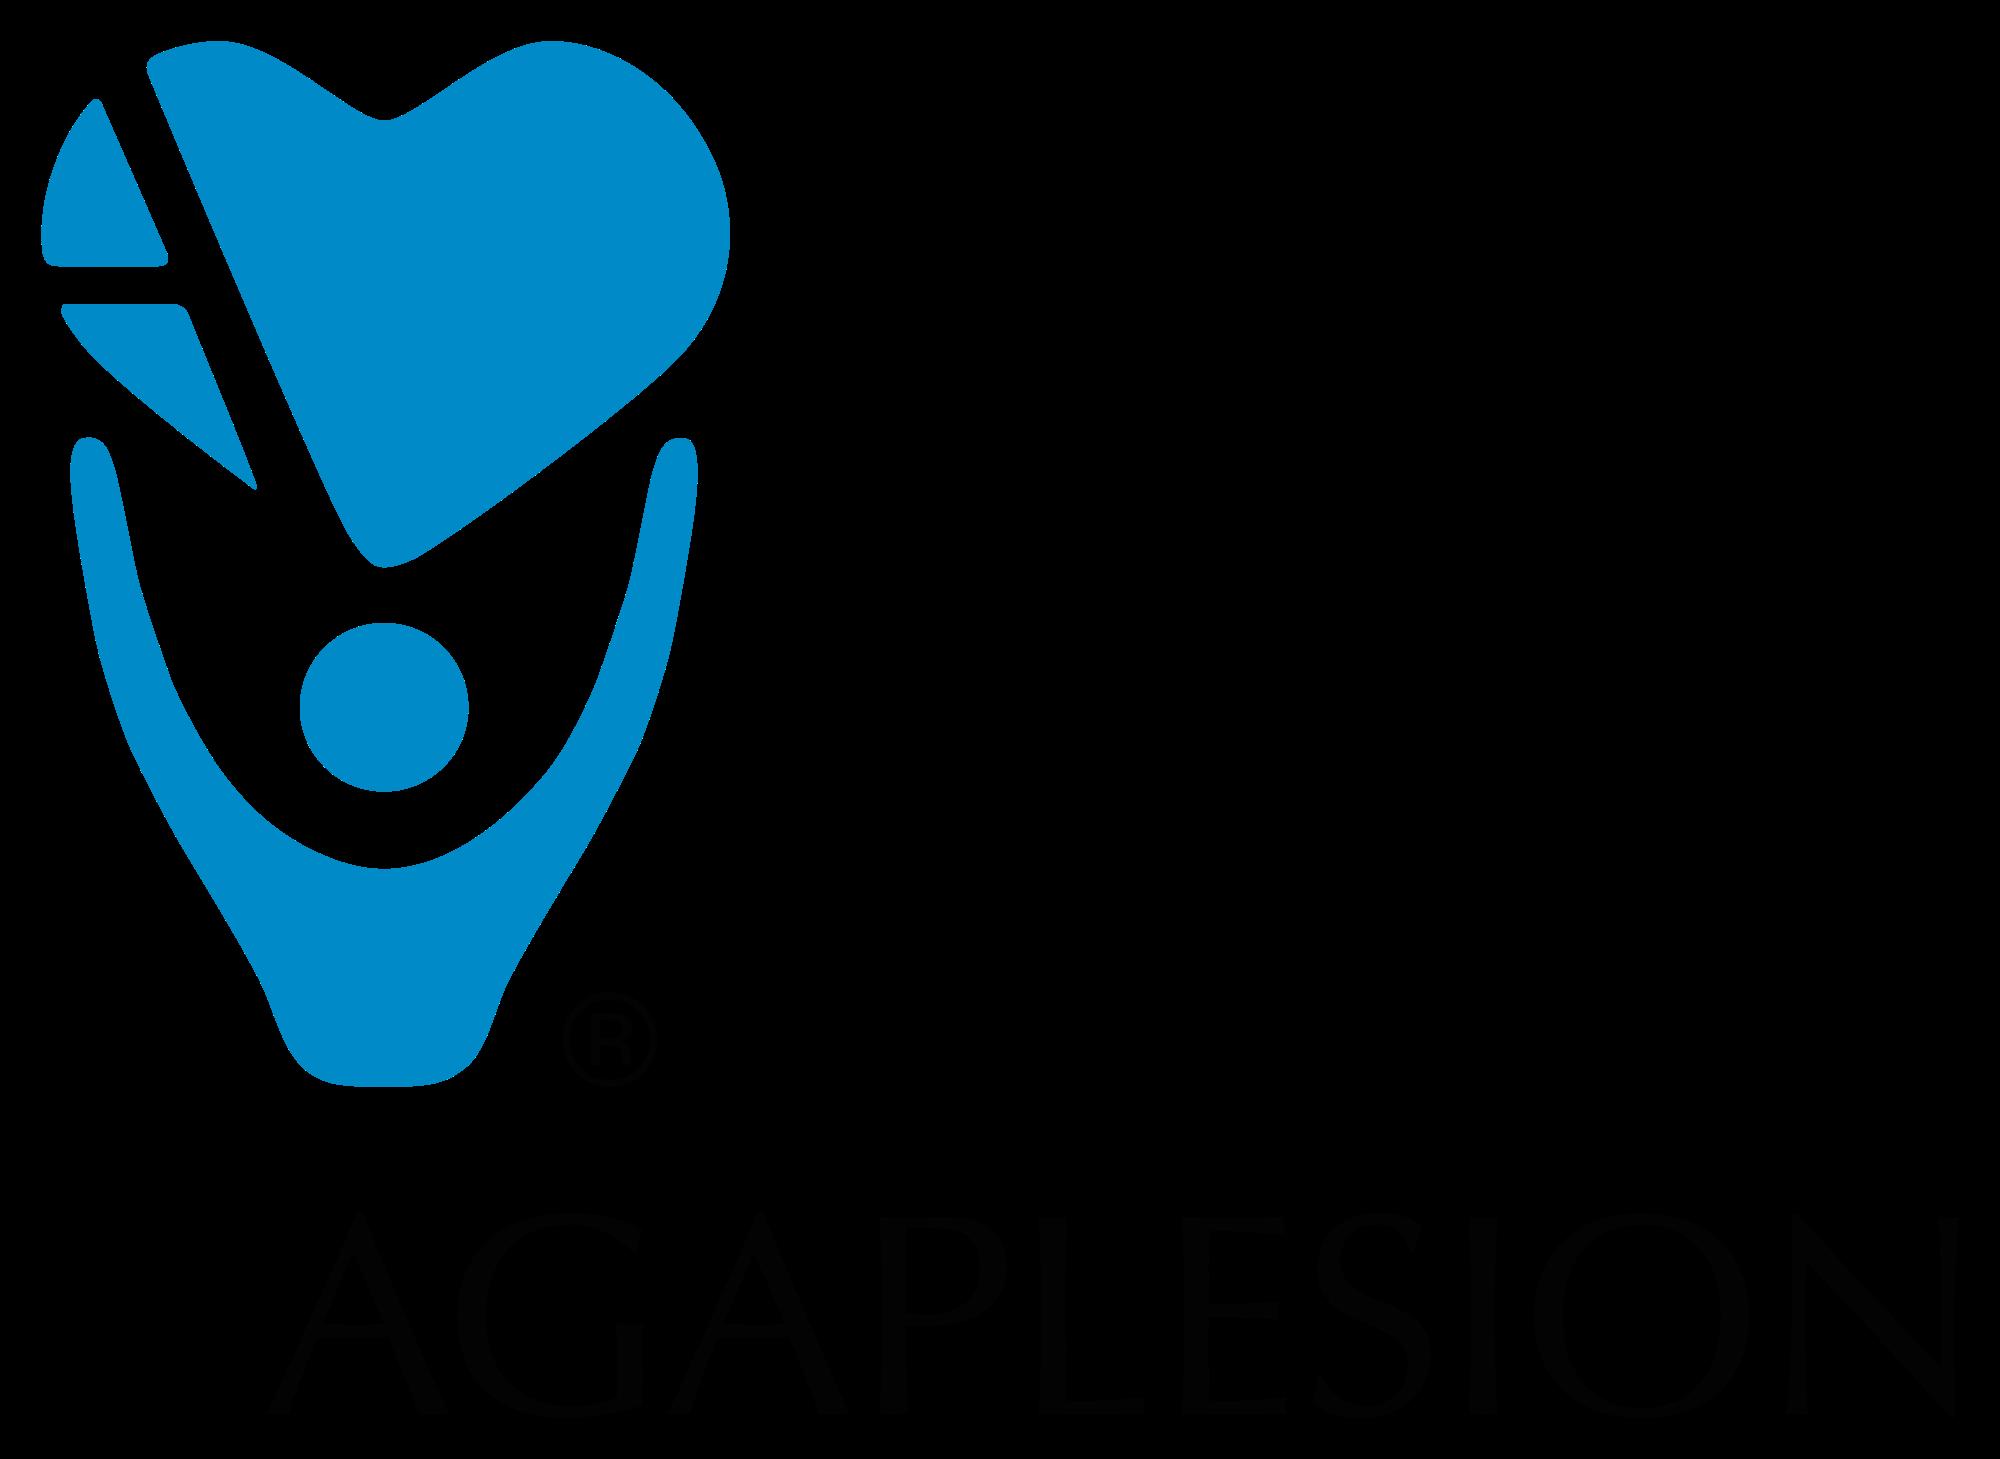 AgaplesionLogo Image